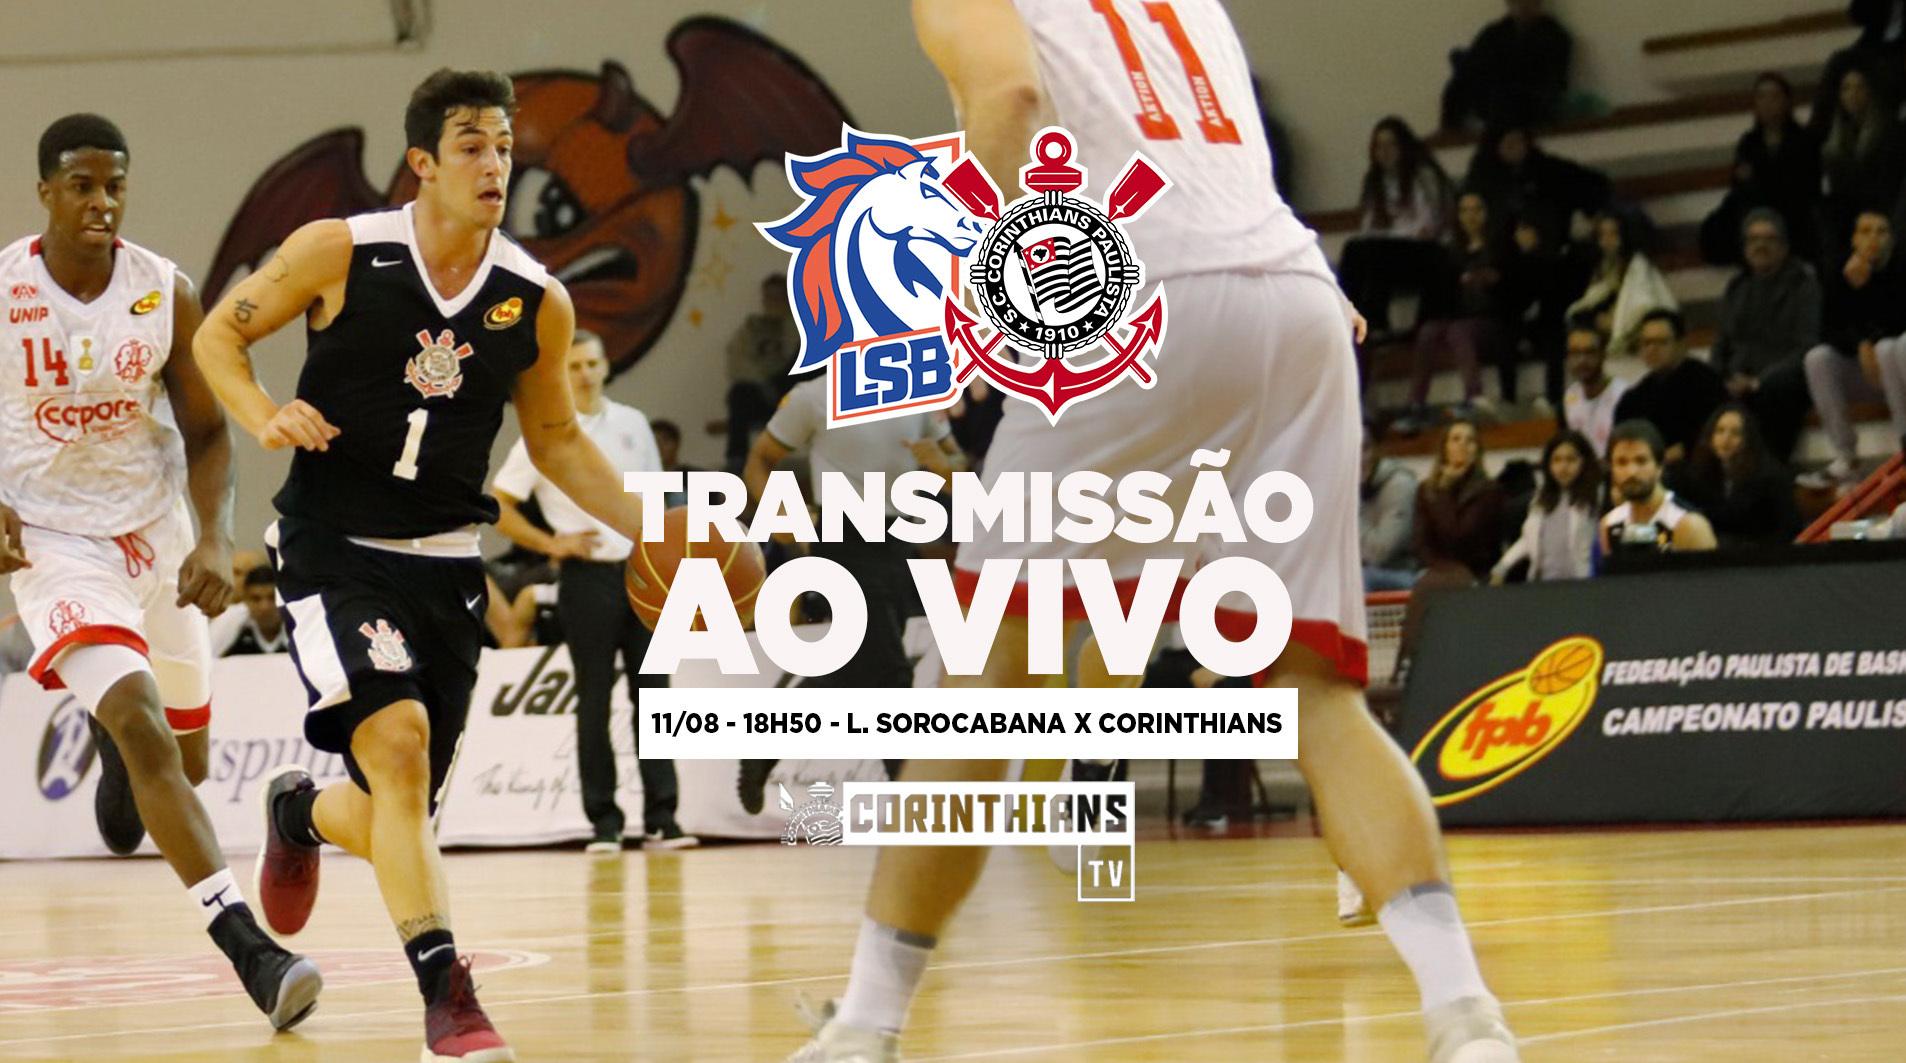 Liga Sorocabana x Corinthians - Campeonato Paulista de Basquete 2018